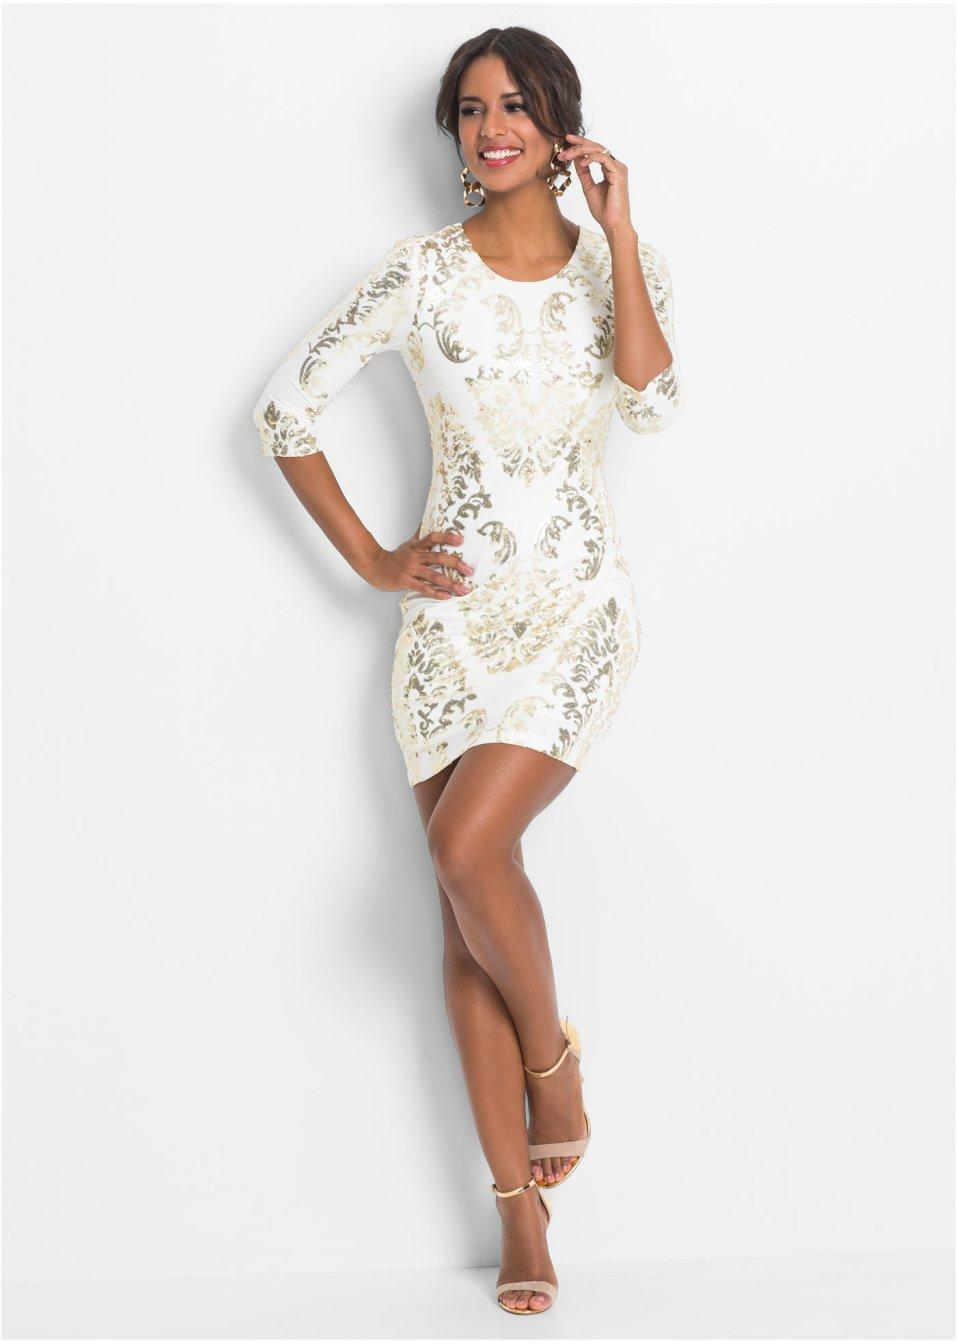 f2510169c2d33 Abito con paillettes Bianco   oro - BODYFLIRT boutique acquista online -  bonprix.it